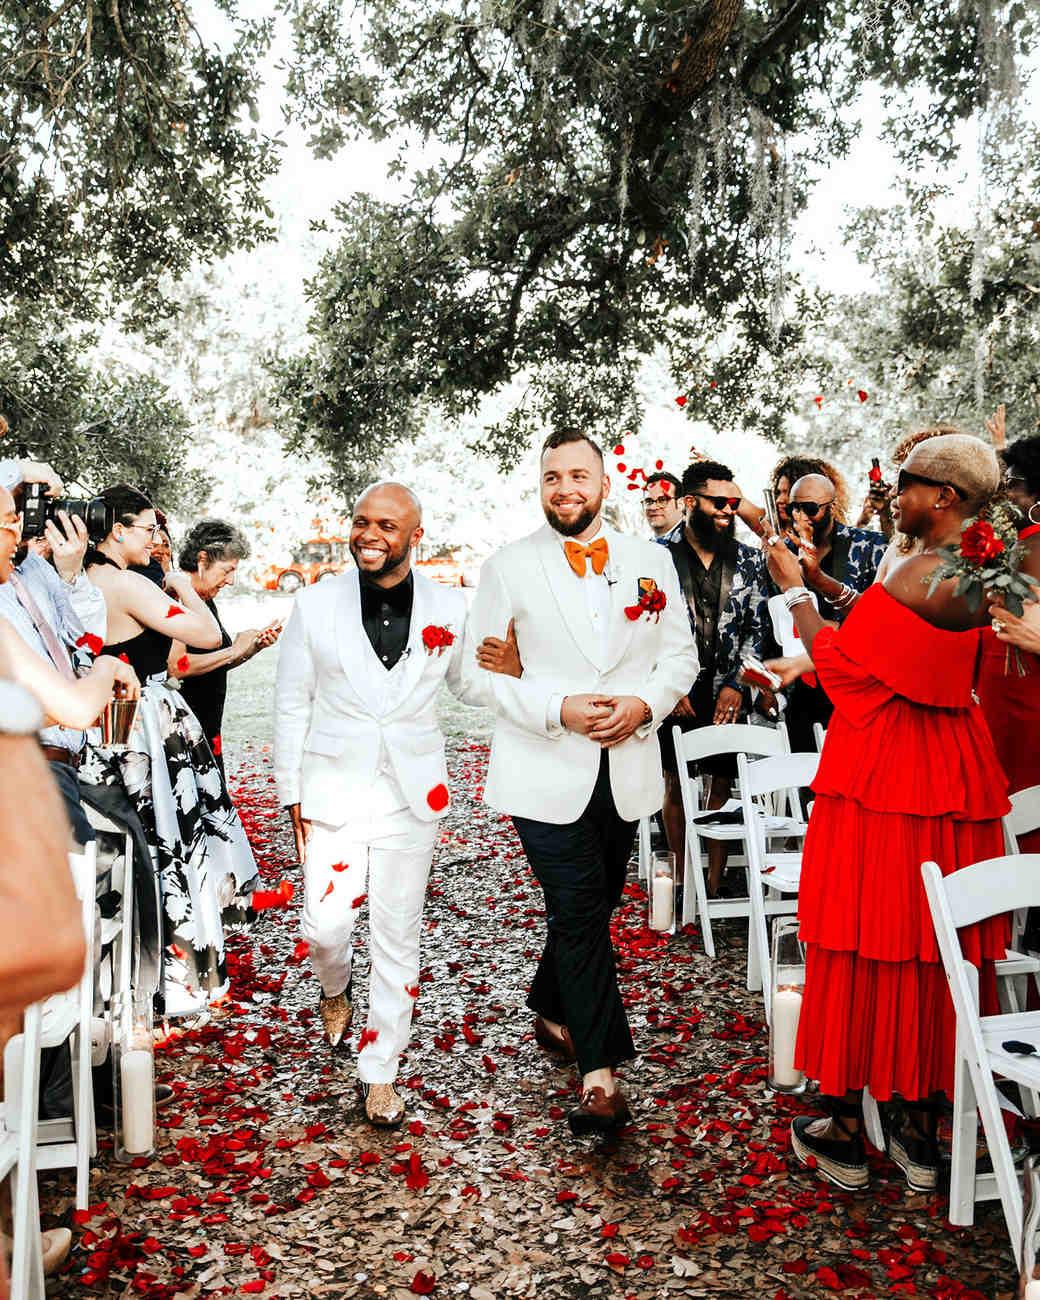 joe-tim-wedding-grooms-recessional-petals-0836-1018_vert.jpg